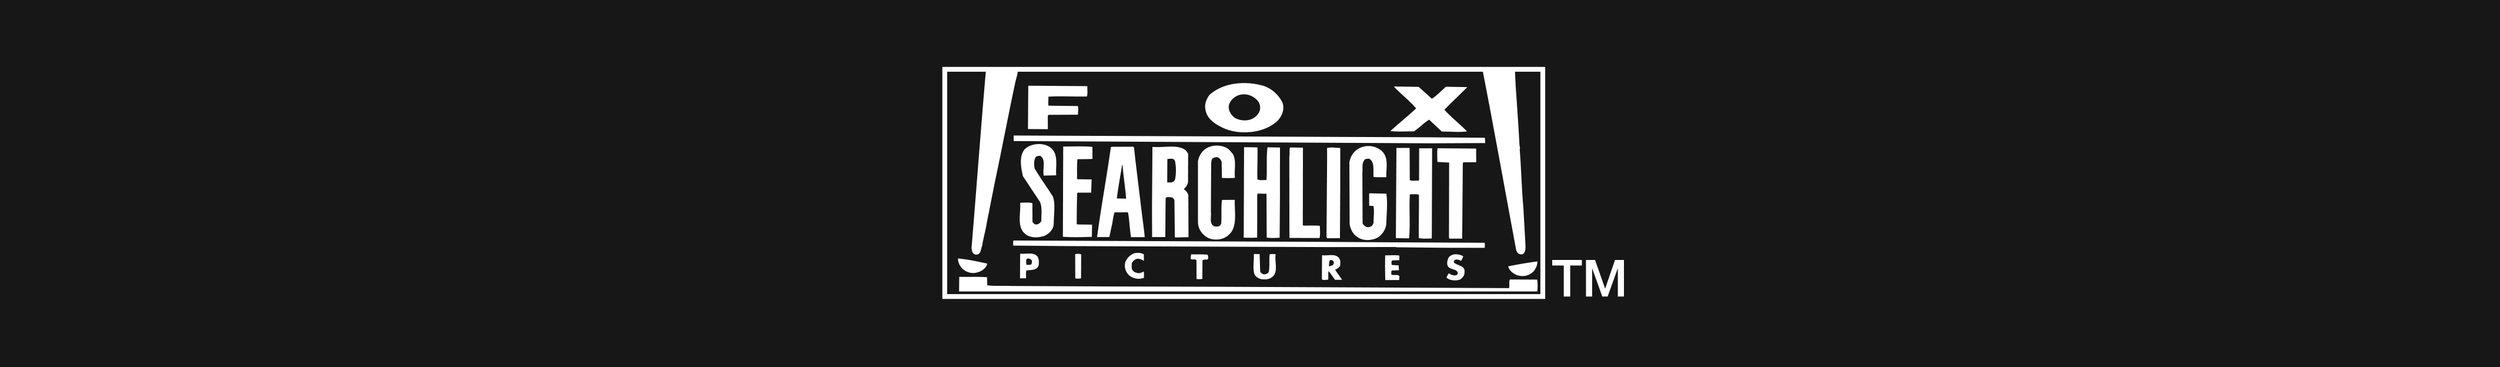 IntWebsite_Clients_White_FoxSearchlight.jpg